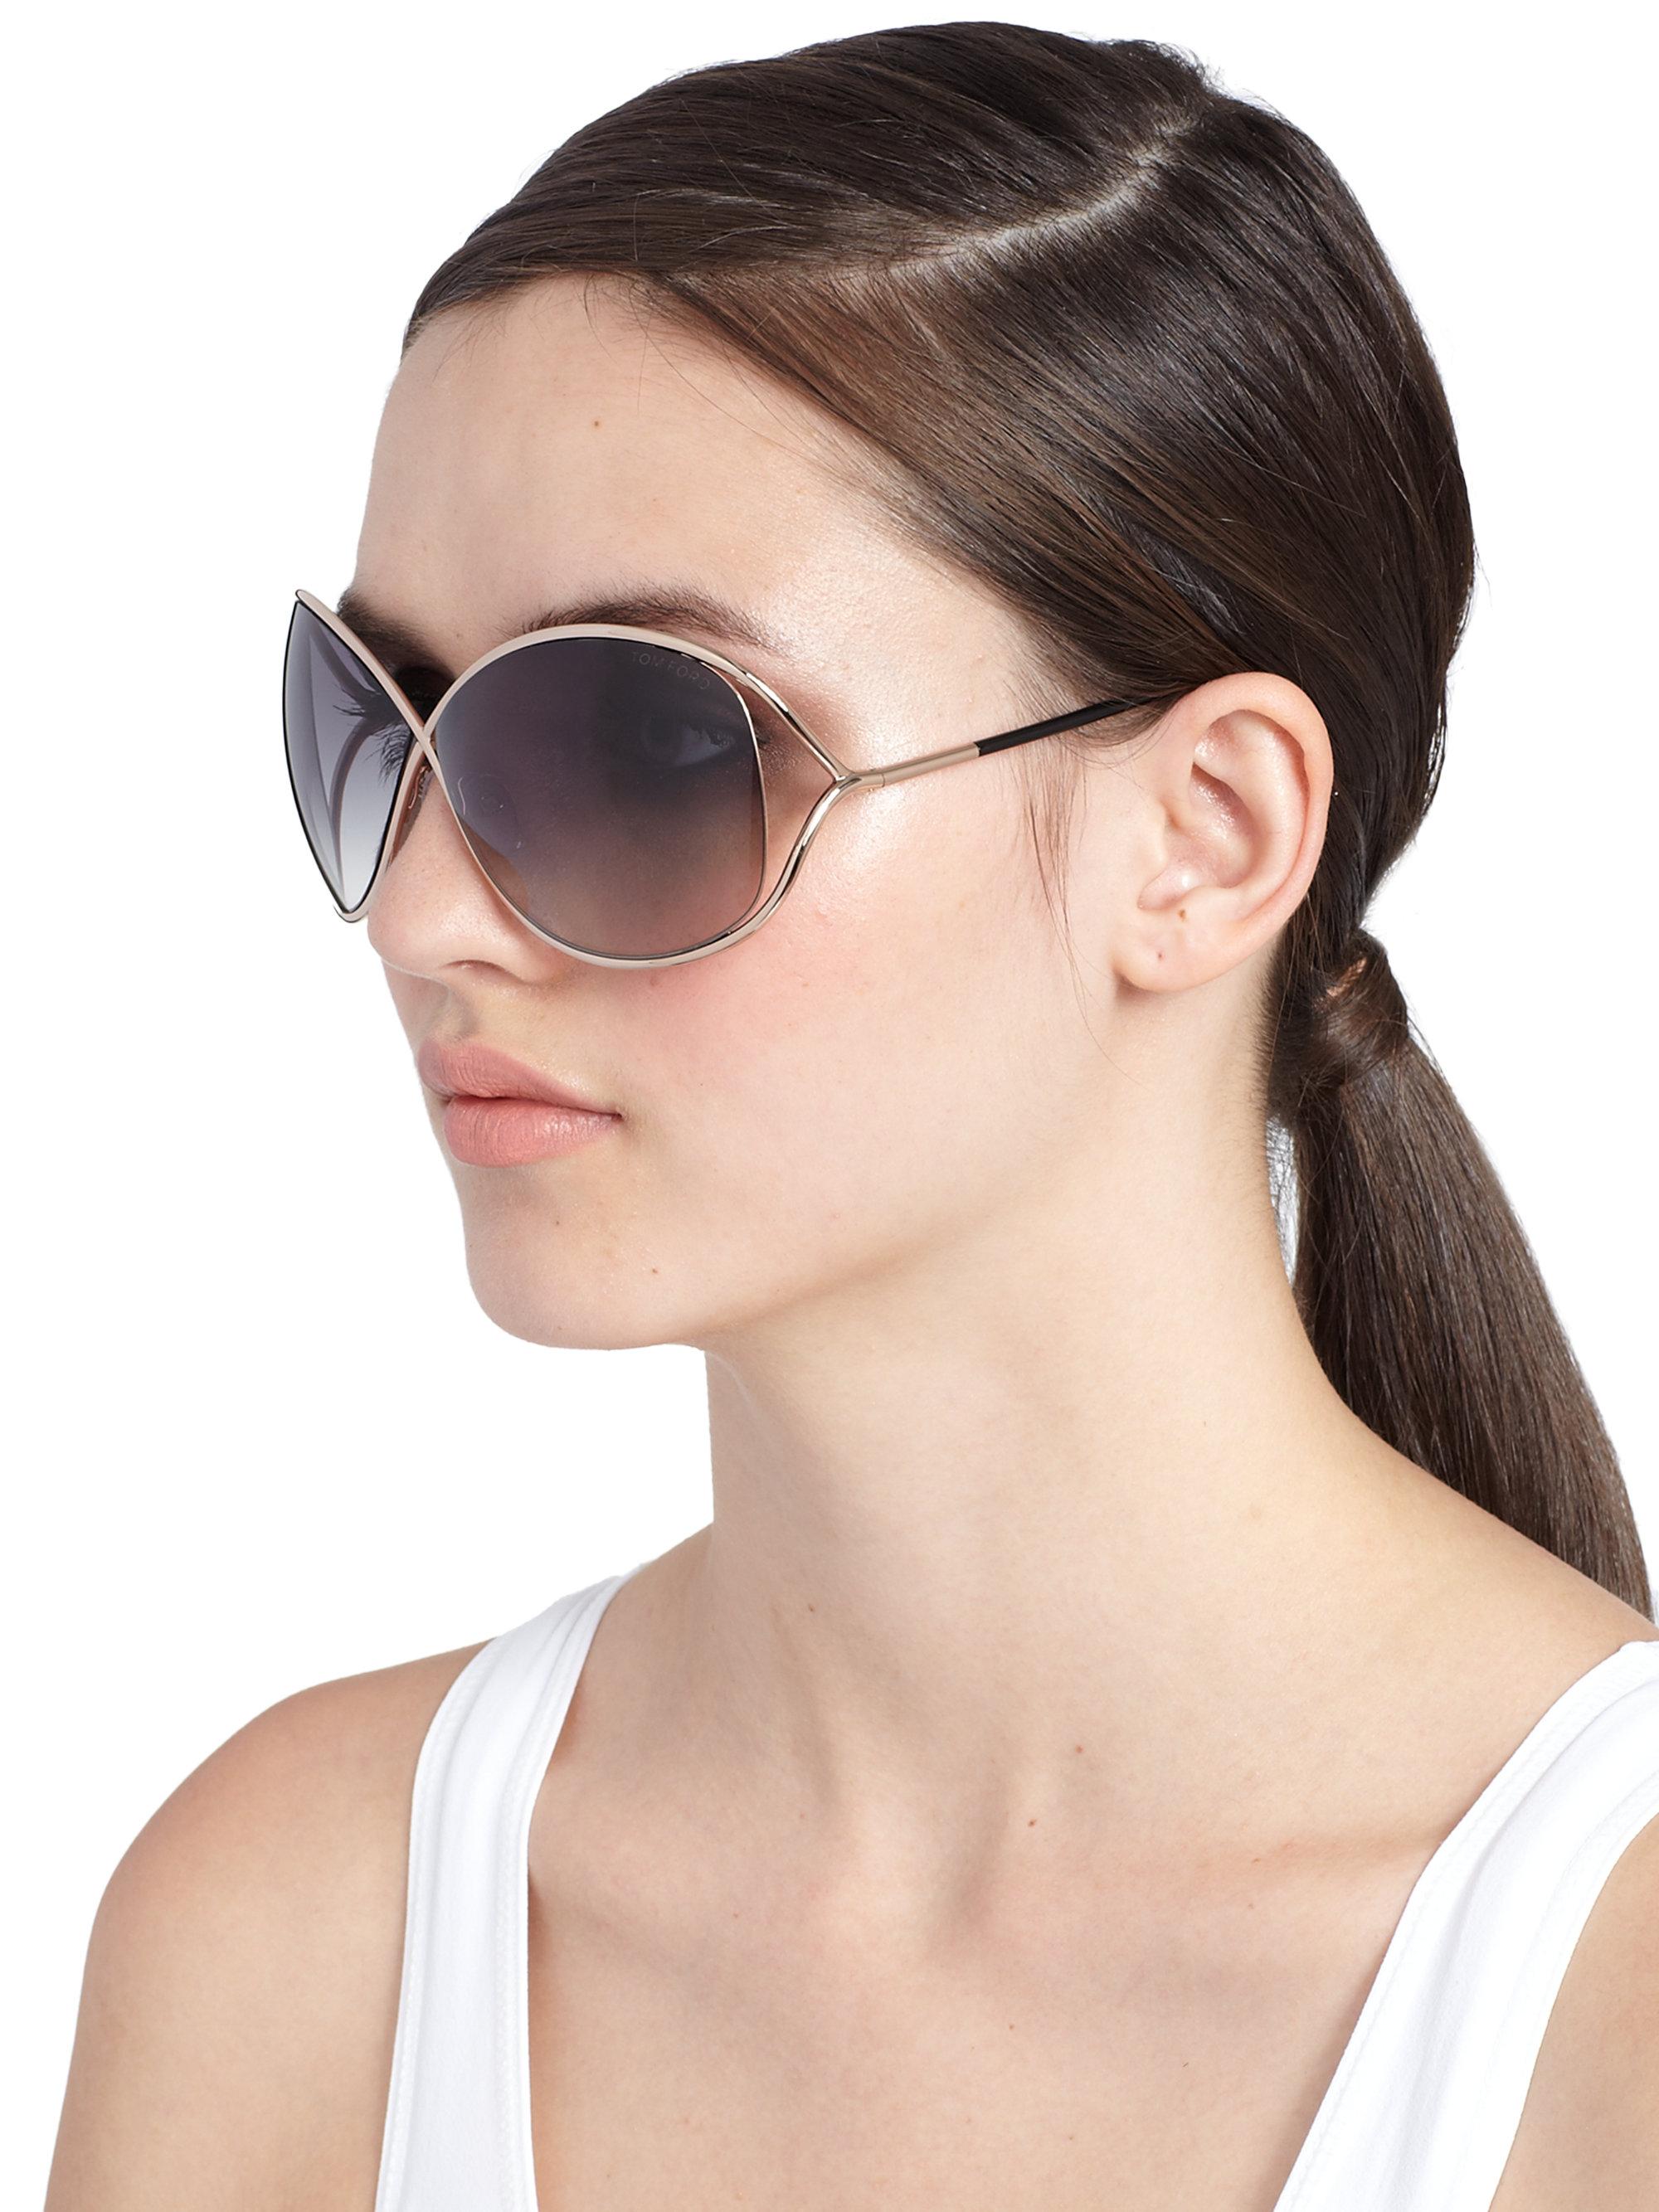 4bef161faa0bf Tom Ford Miranda 68Mm Round Sunglasses in Metallic - Lyst